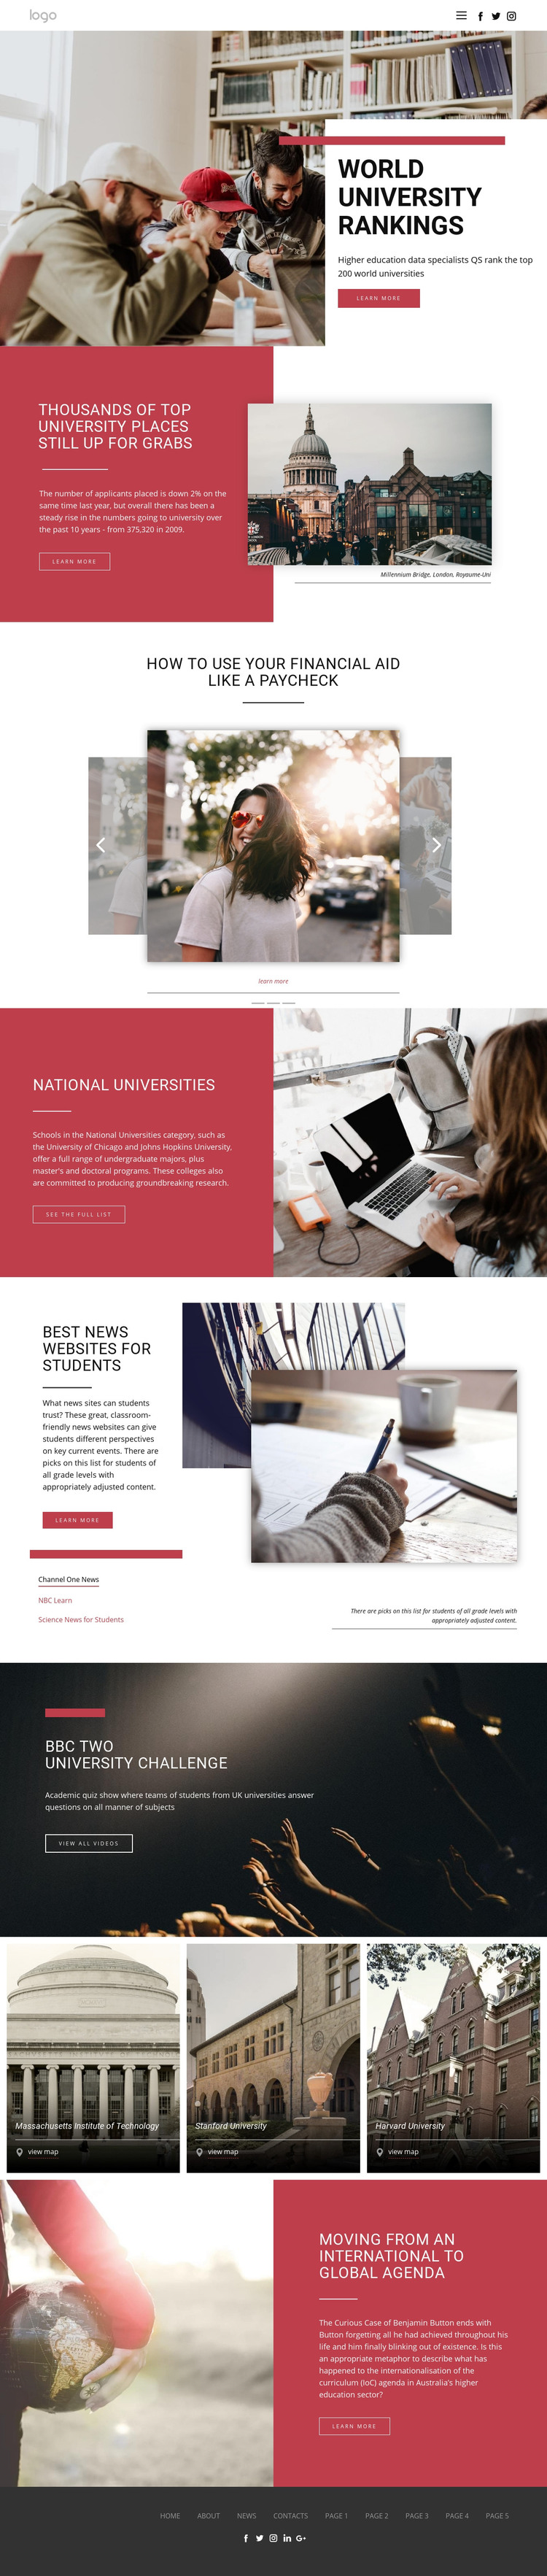 Ranking university education Homepage Design